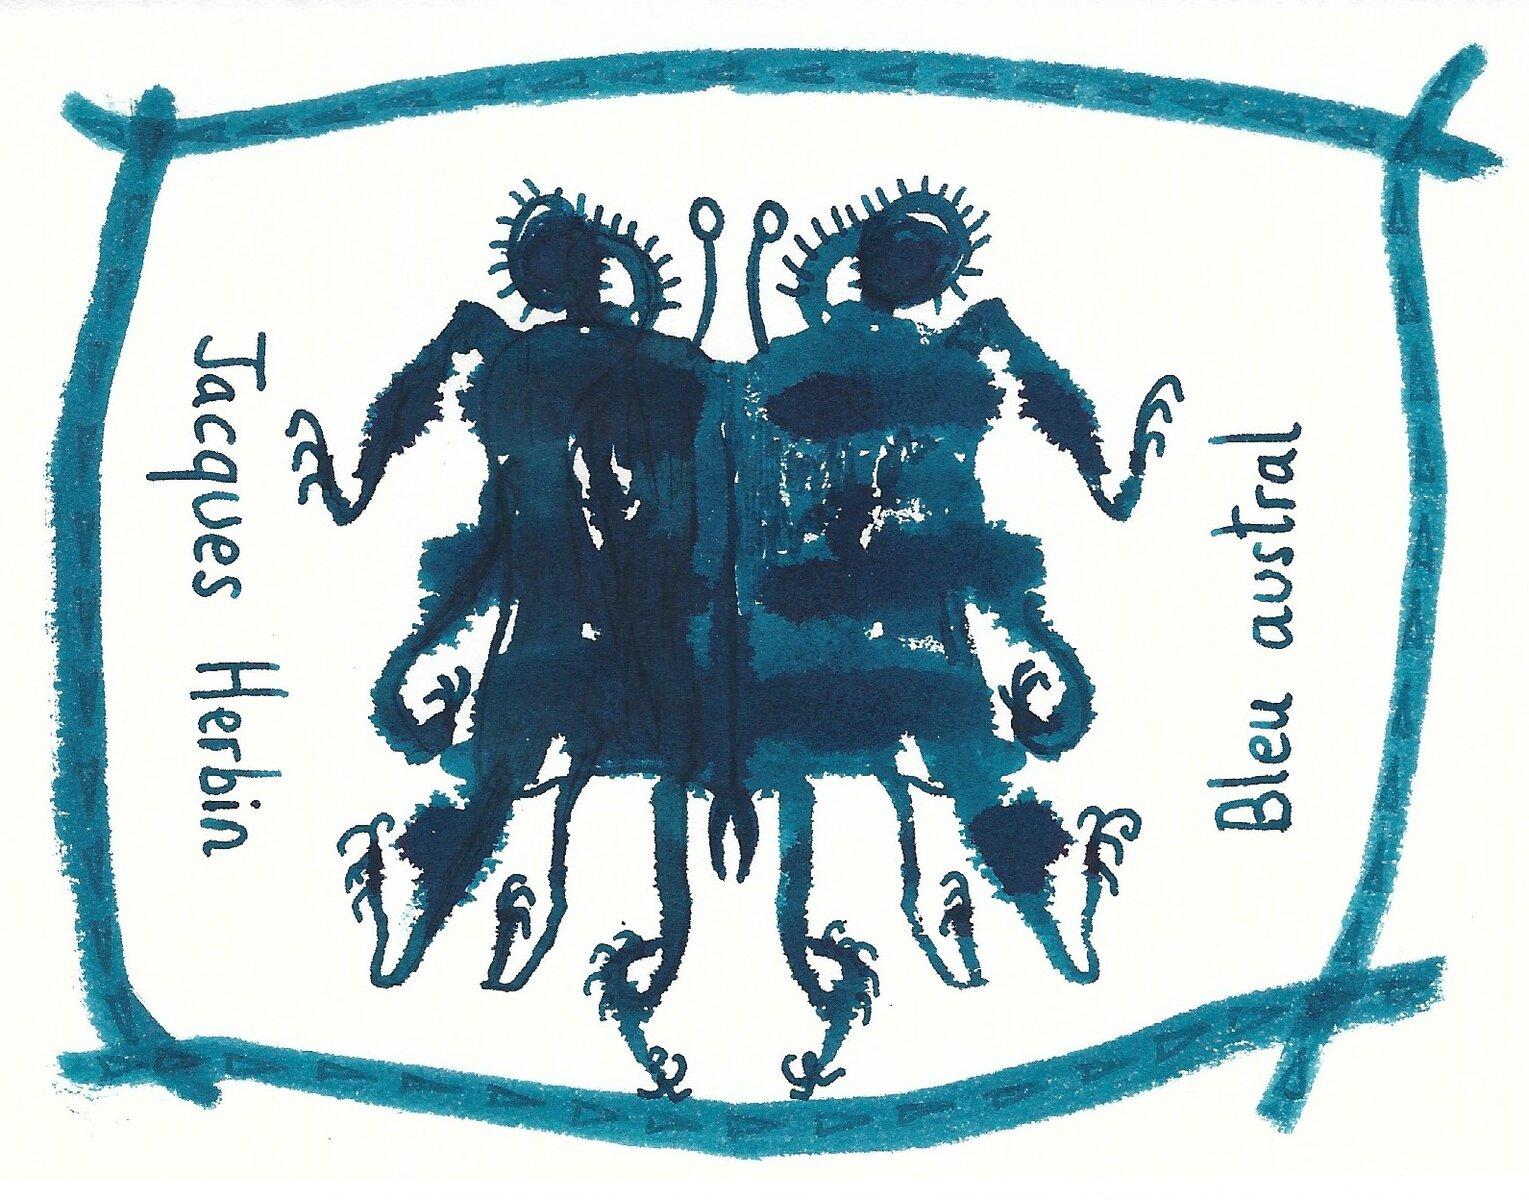 jacques herbin - bleu austral - title 300ppi.jpeg